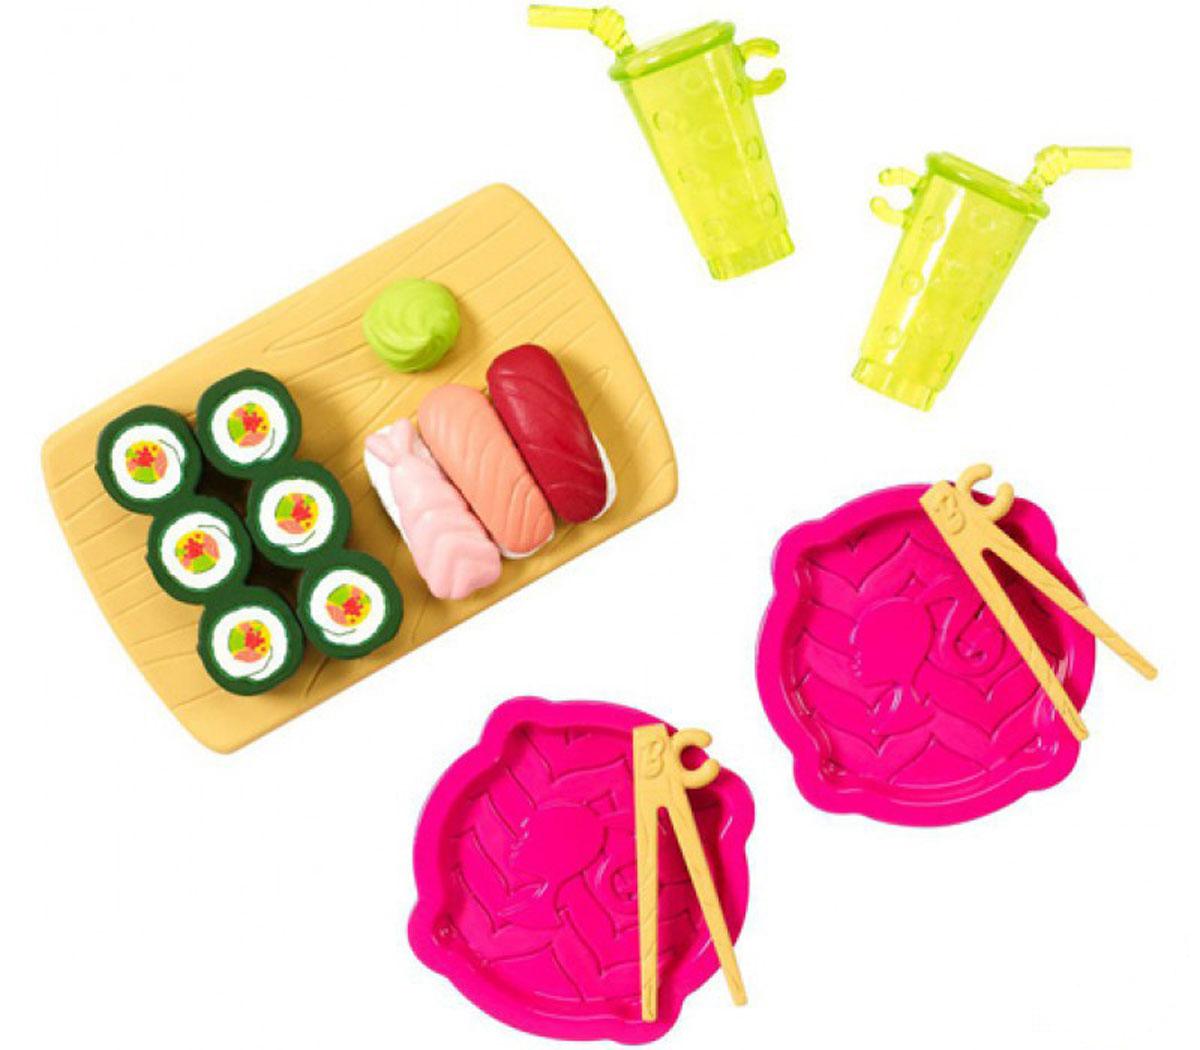 Barbie Мини-набор для декора Суши и роллы barbie набор для декора дома холодильник с продуктами cfg65 cfg70